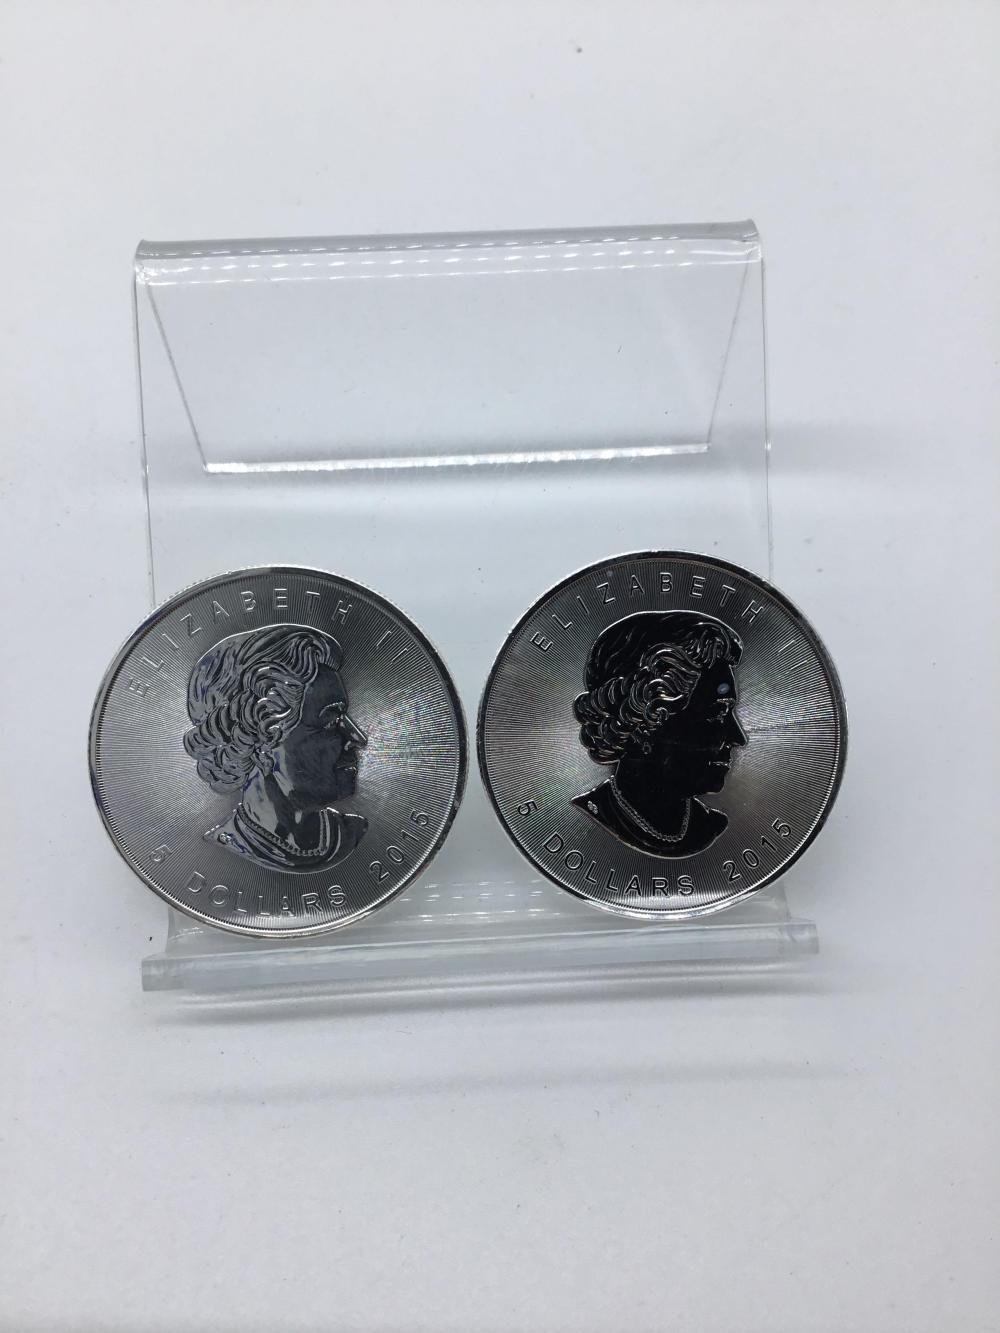 2015 Canada Maple leaf 1oz fine silver $5 coin